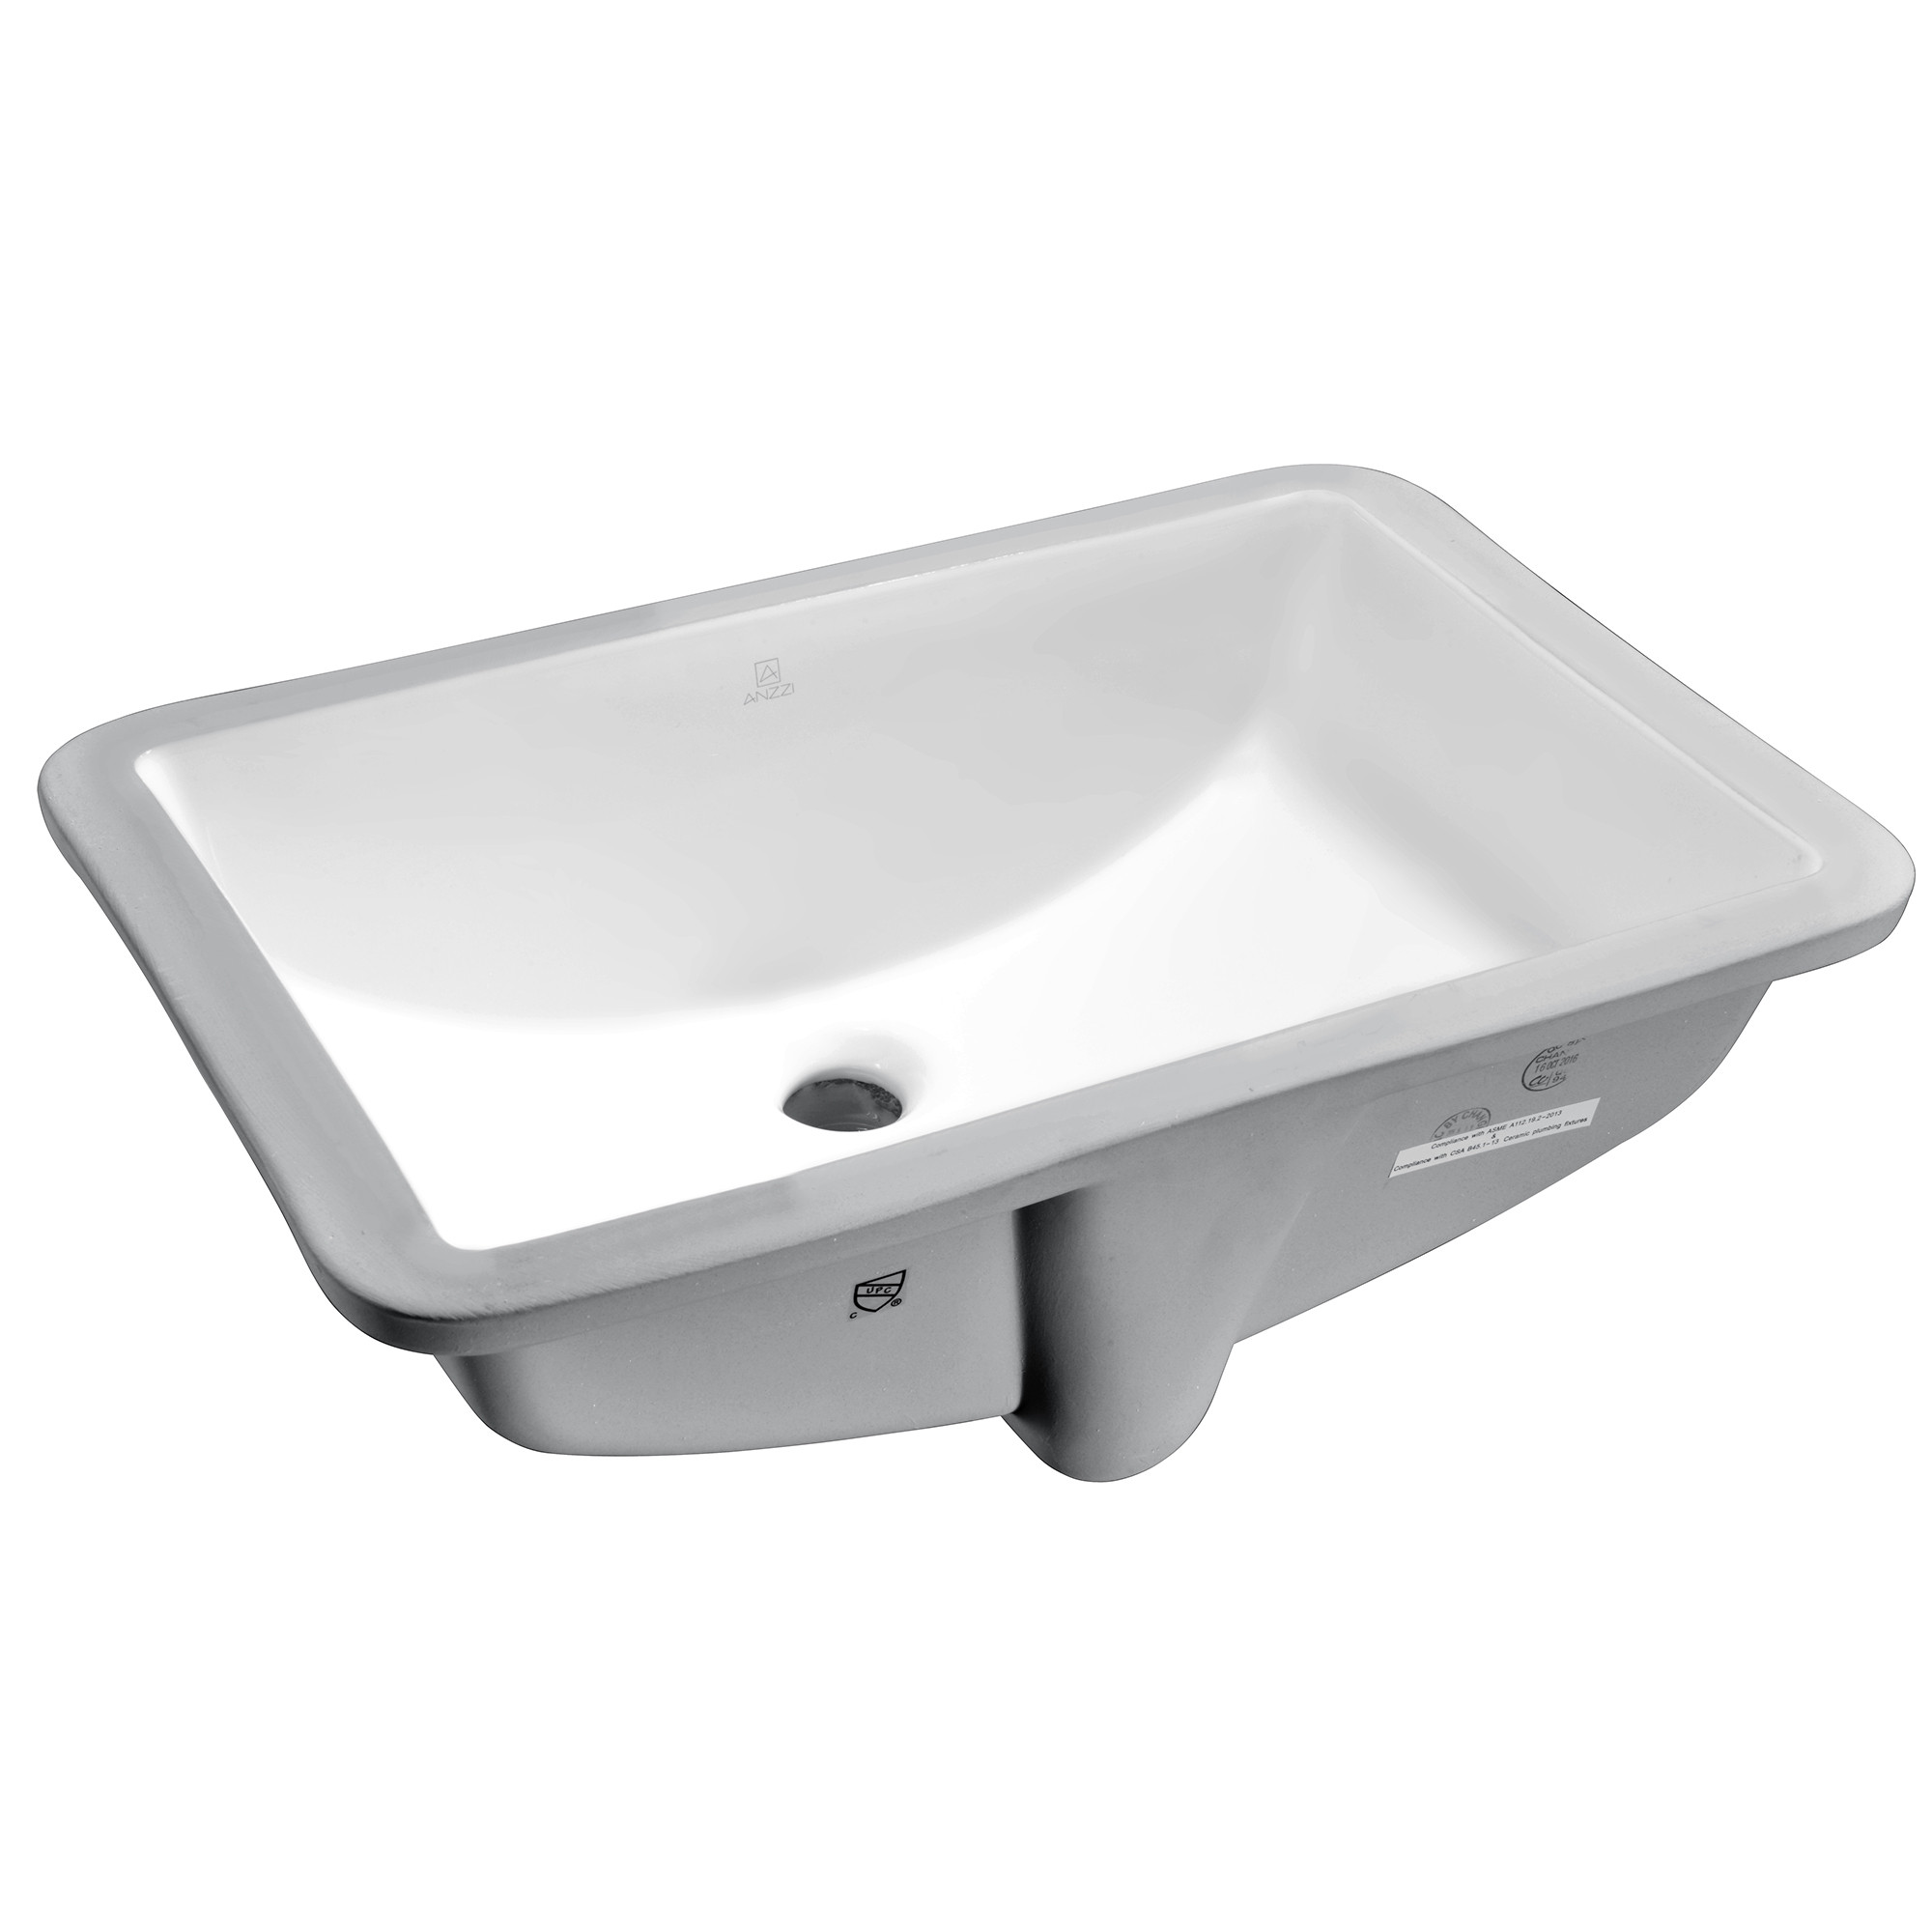 ANZZI LS-AZ107 Pegasus Series 21 Inch Ceramic Undermount Sink Basin - White